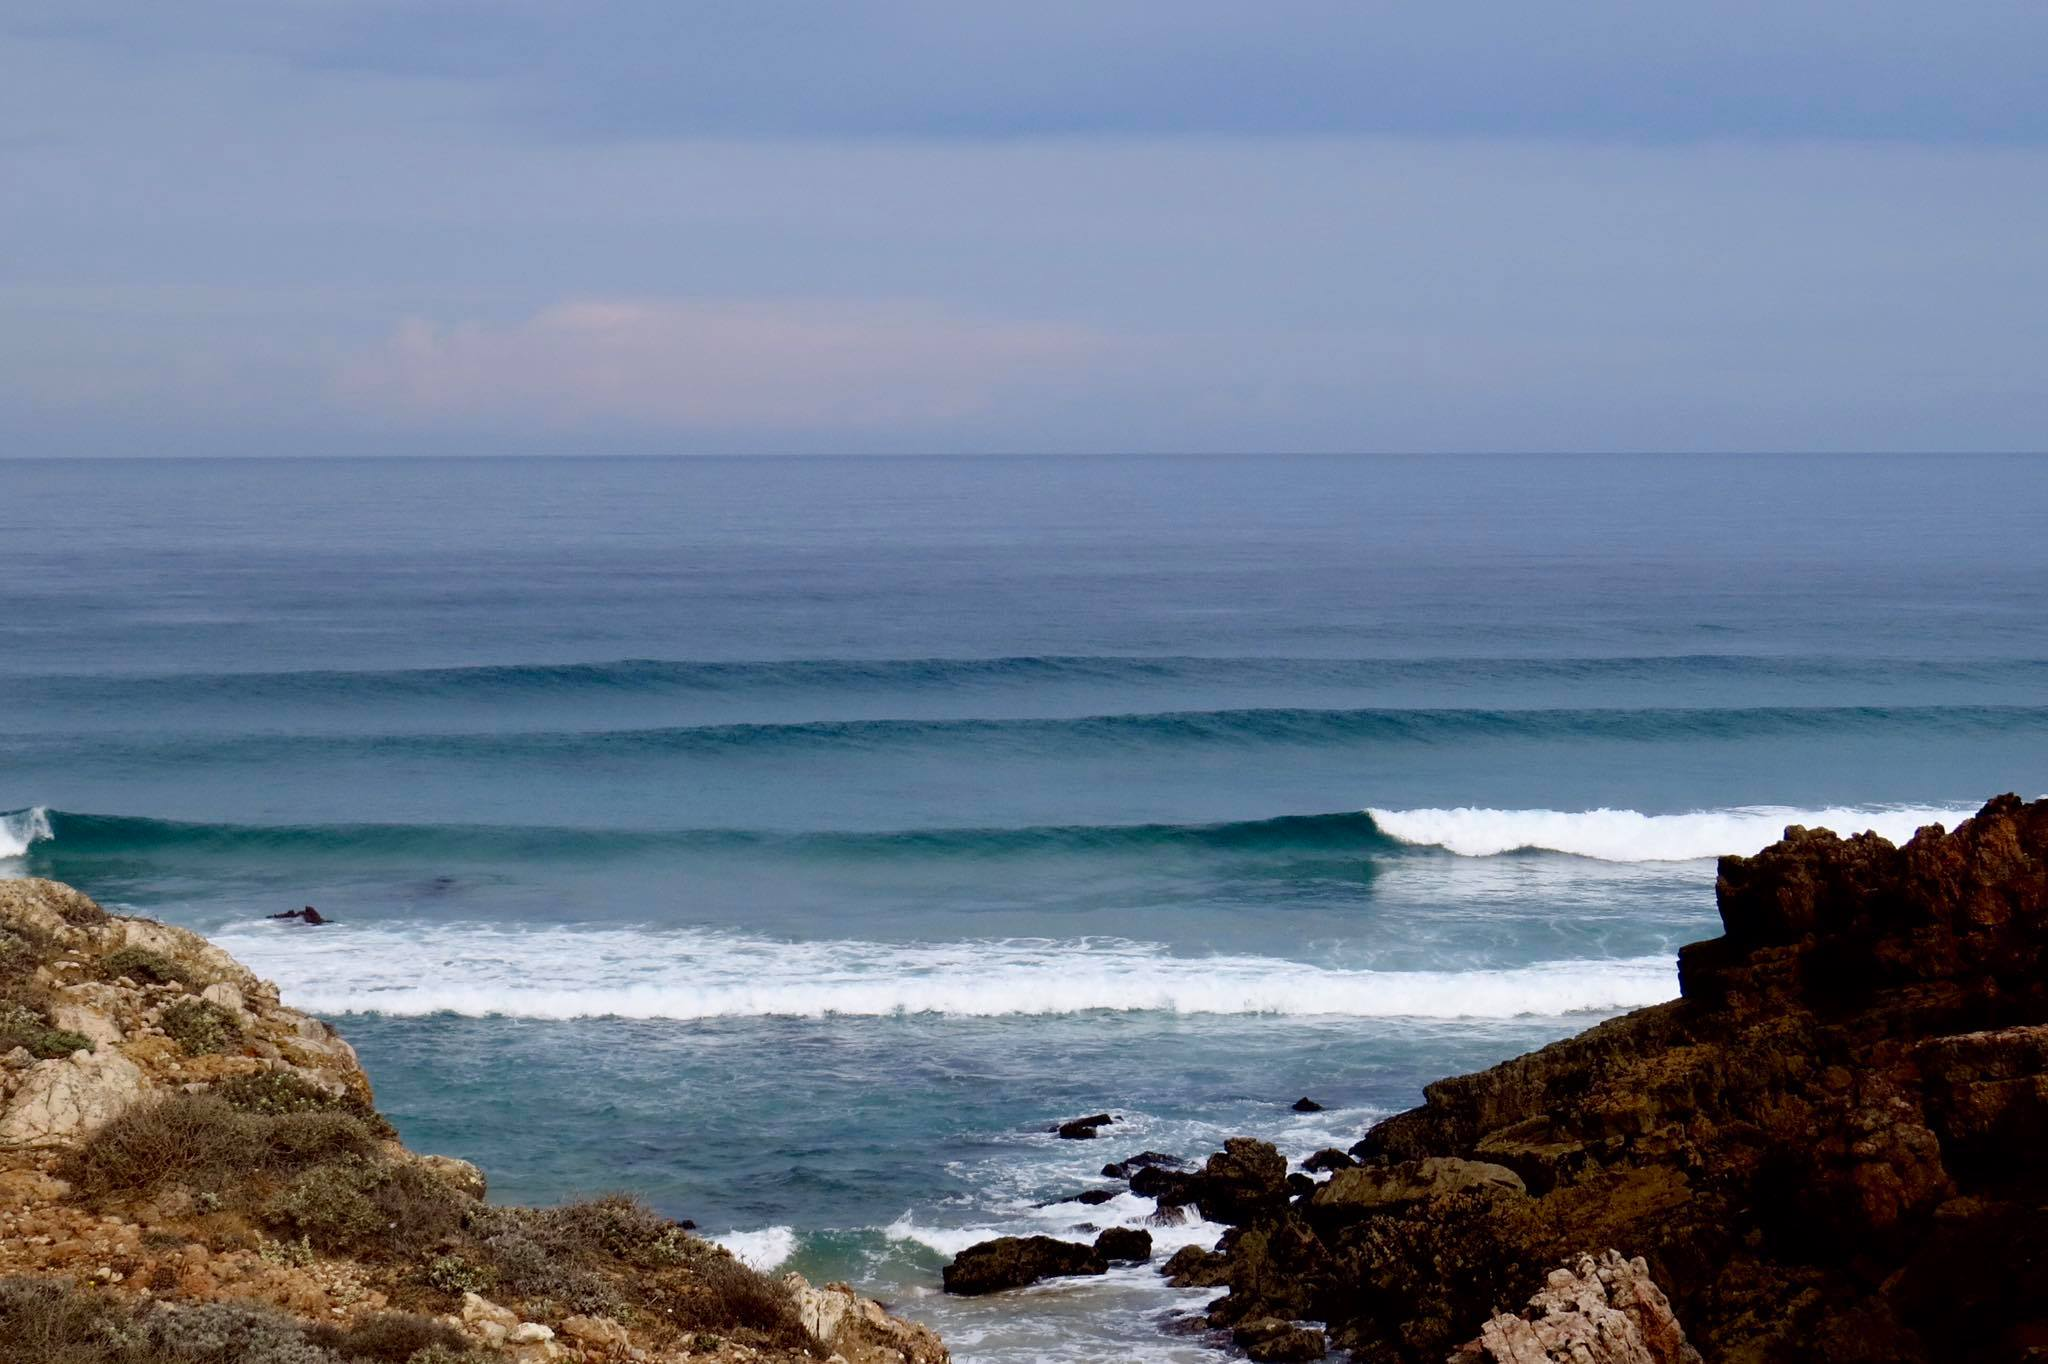 bordeira swell lines